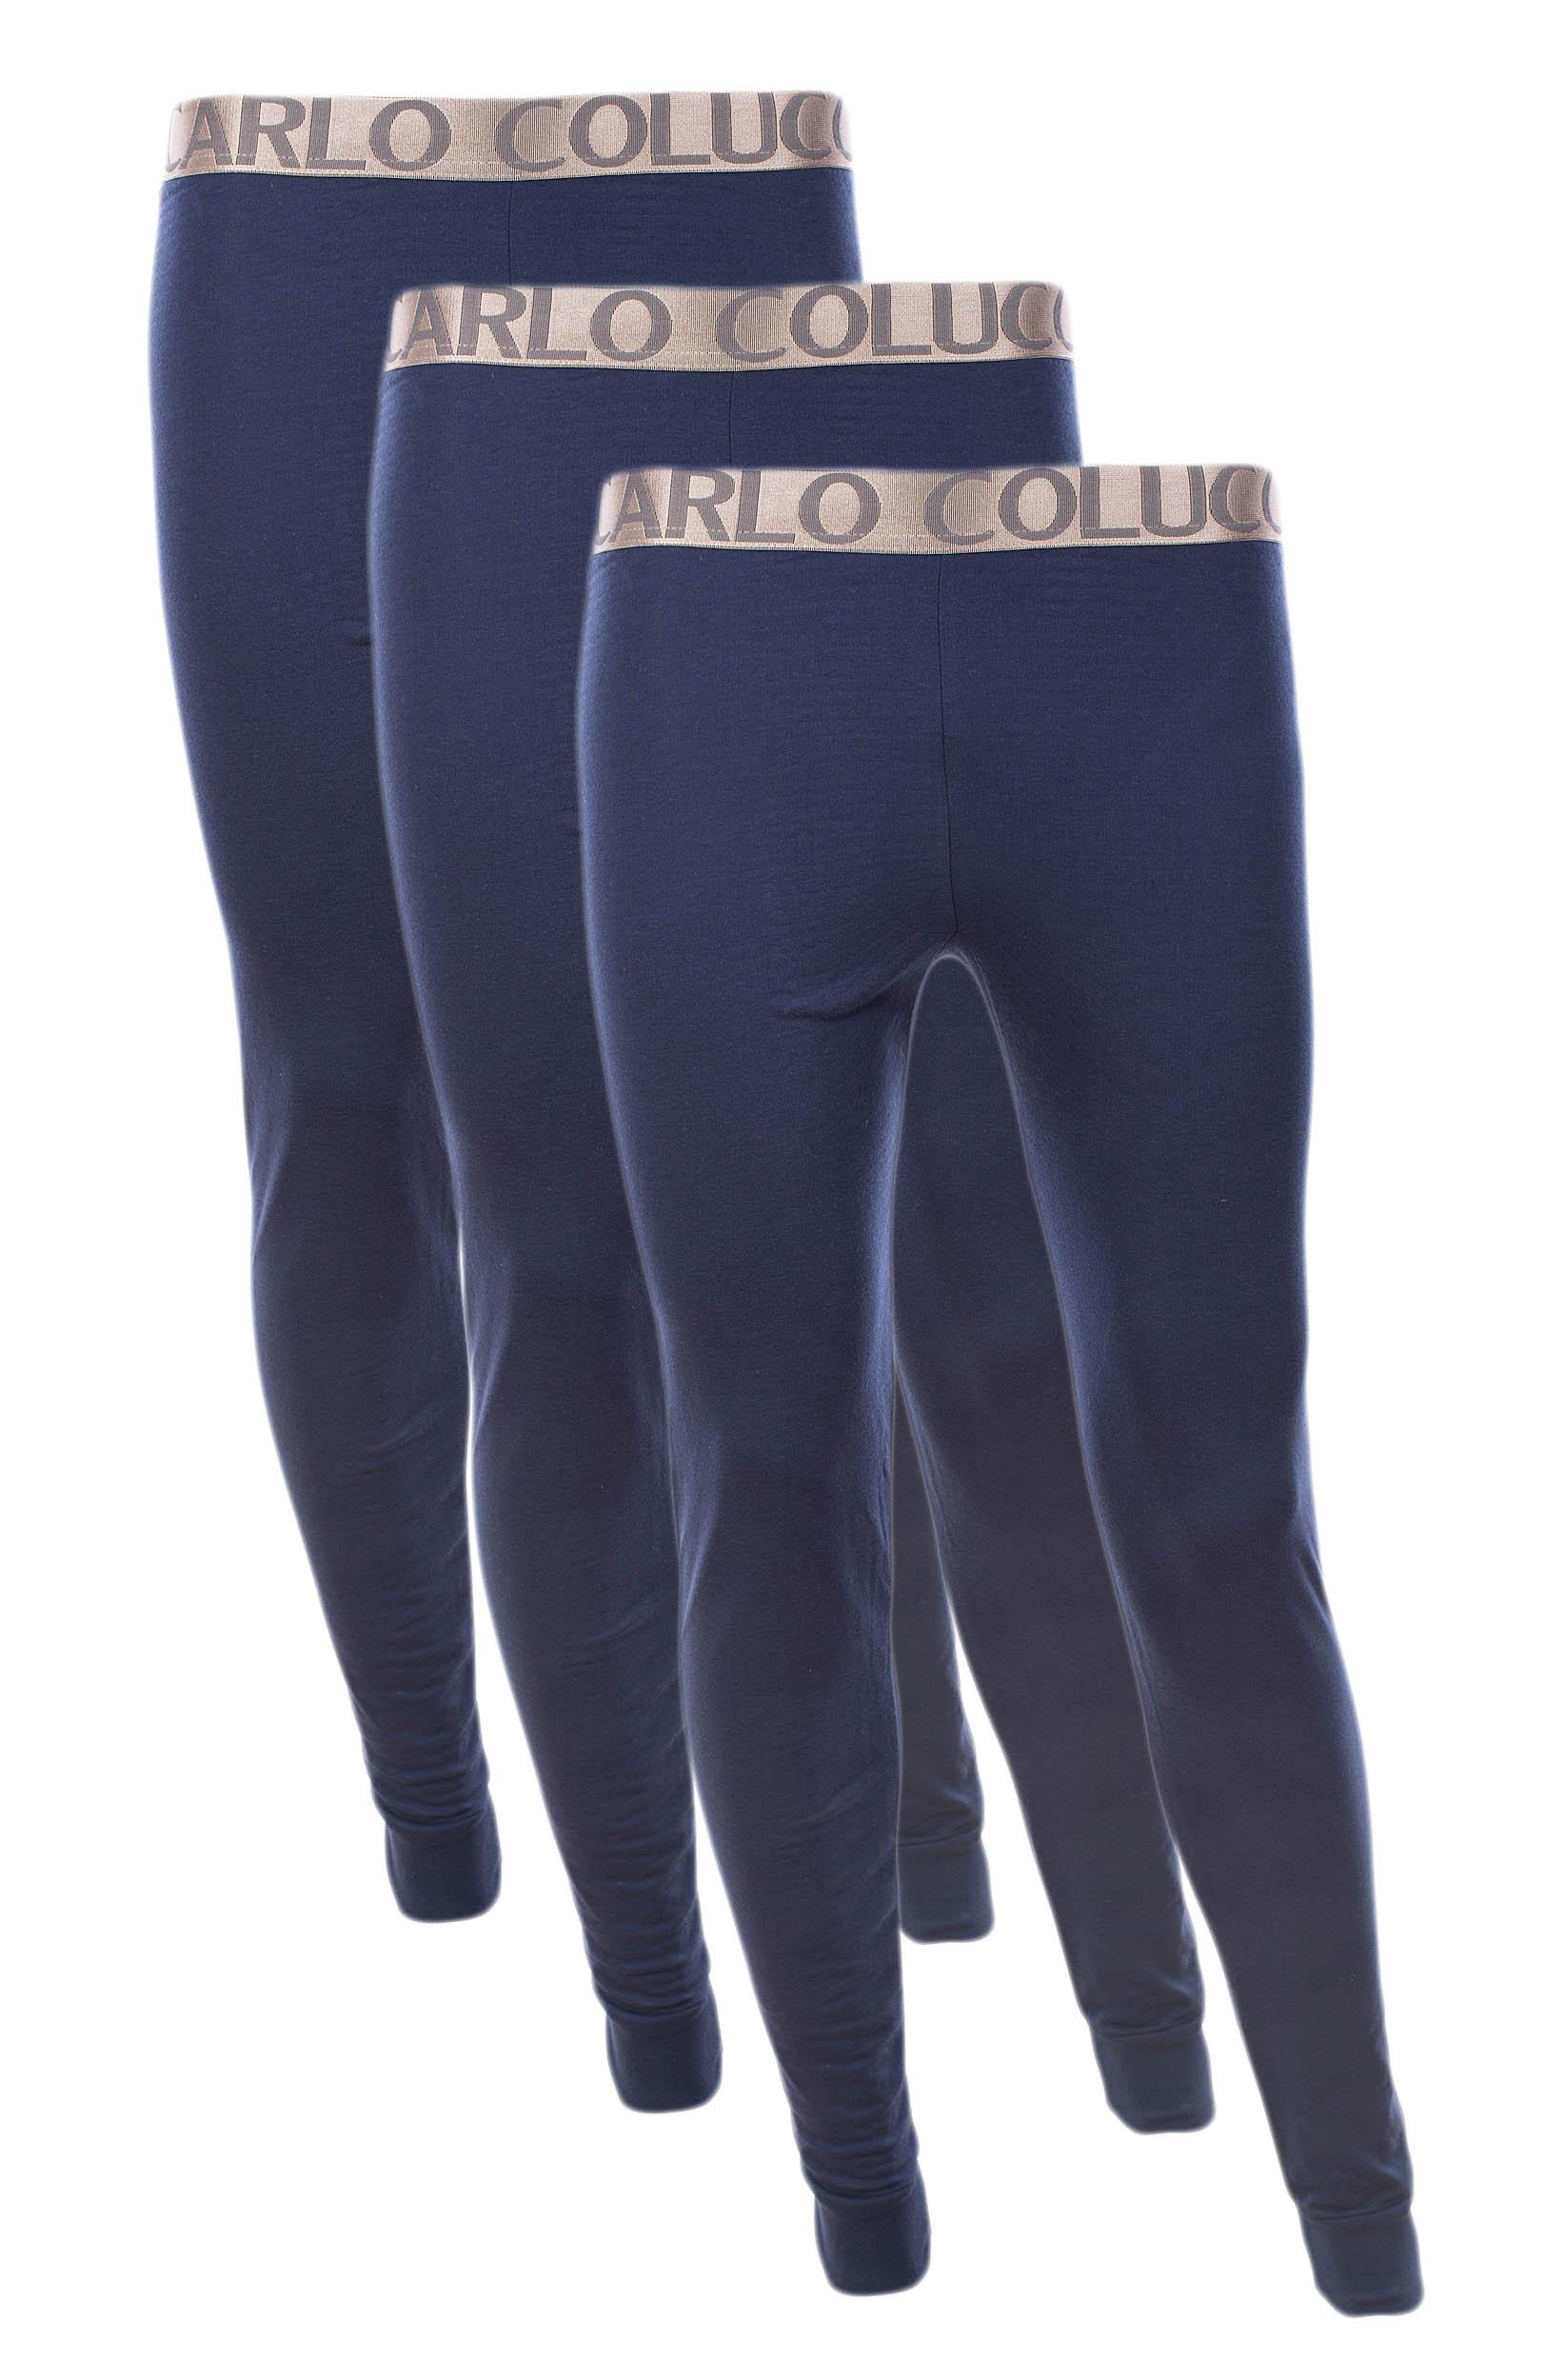 Shirt Winter Thermowäsche von Carlo Colucci THERMO LANGARMSHIRT Ski